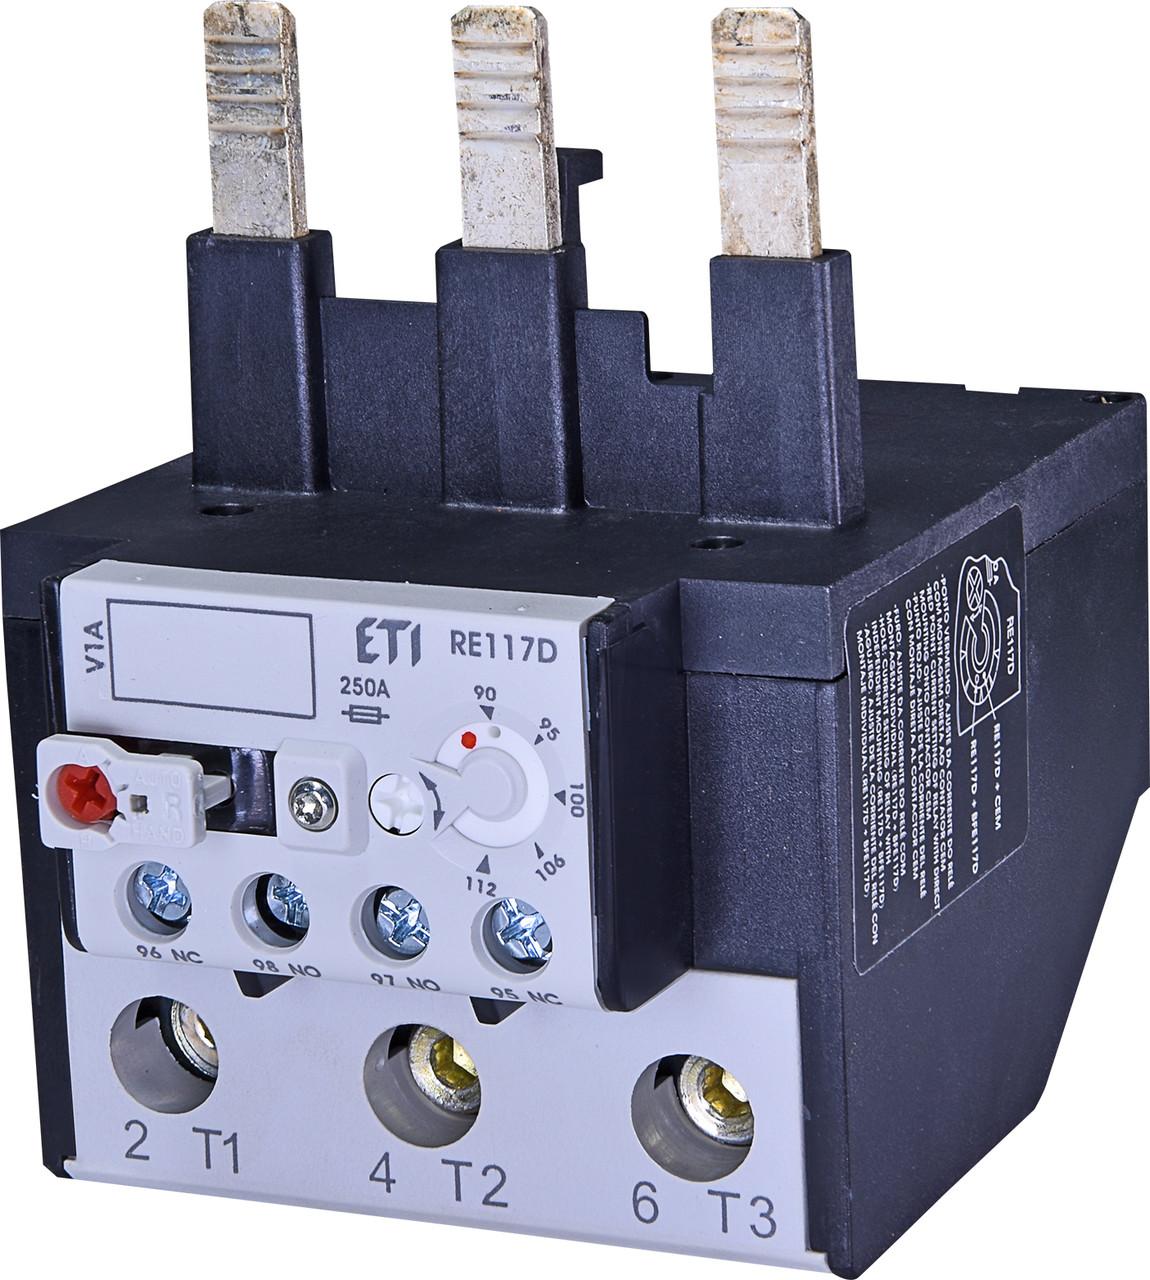 Тепловое реле ETI RE 117.1D-112 (90-112A) CEM95-CEM105 4645422 (для контакторов CEM95, CEM105)